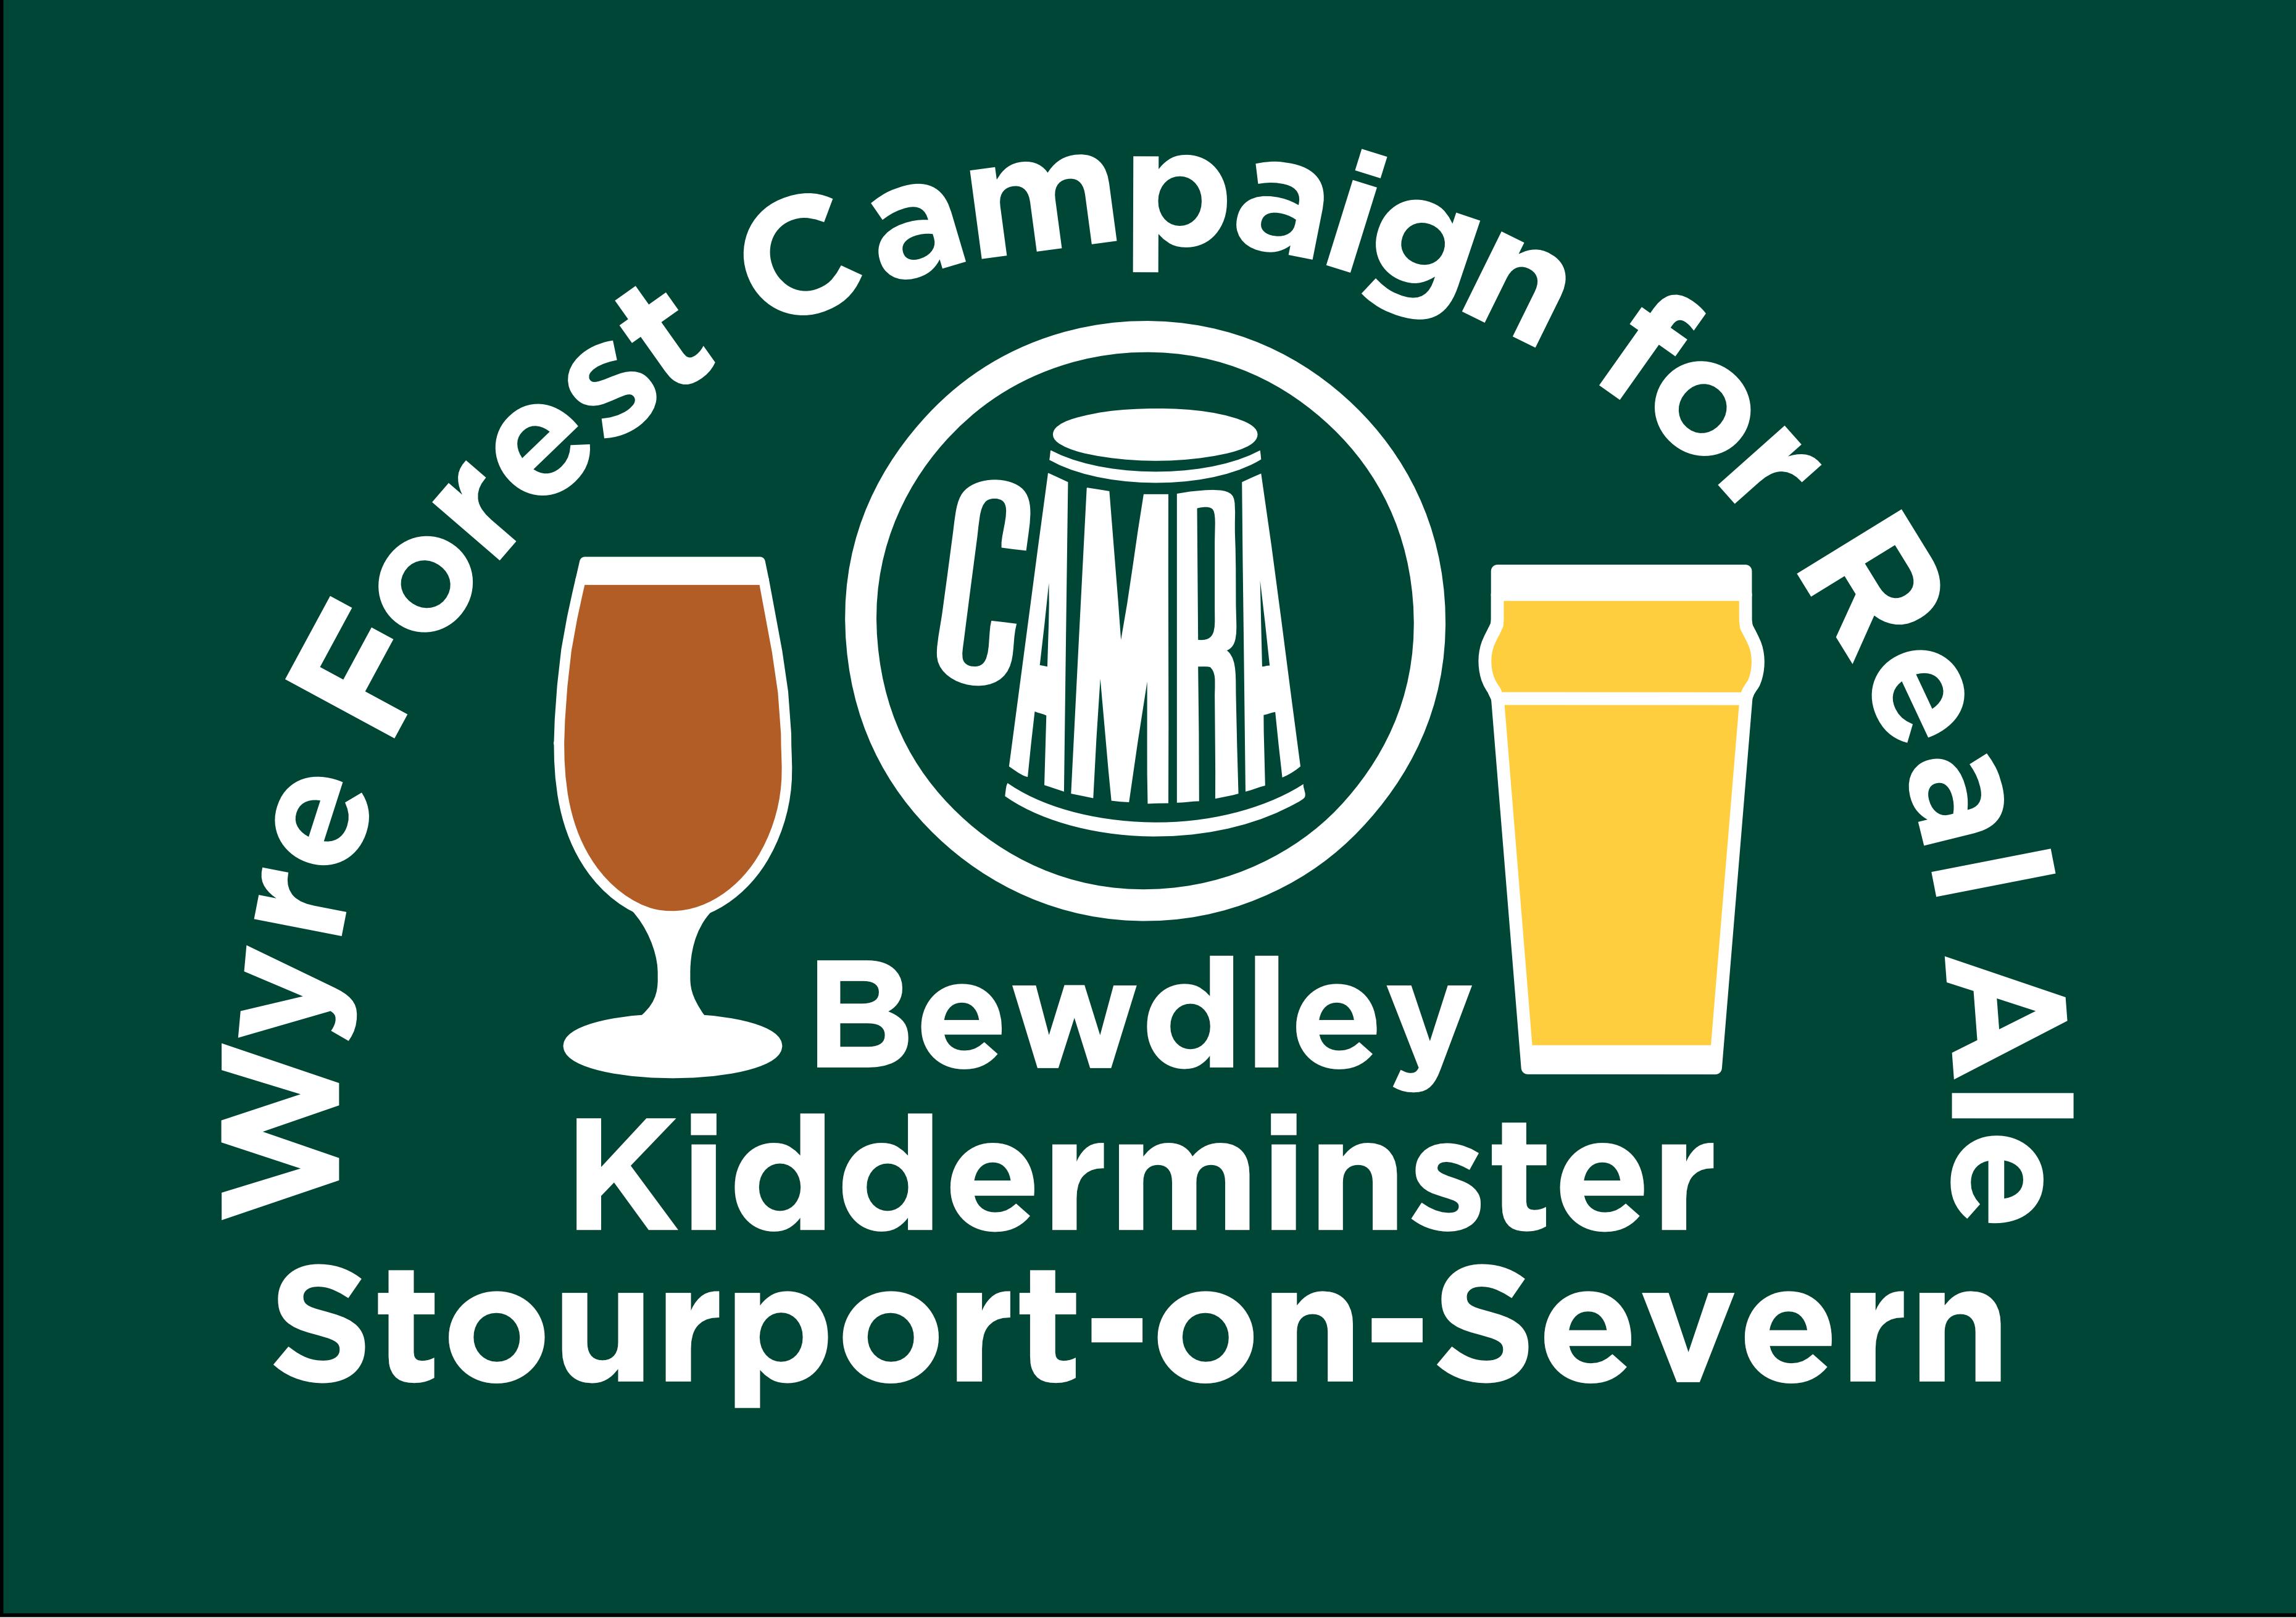 Kidderminster Beer & Cider Festival 2019